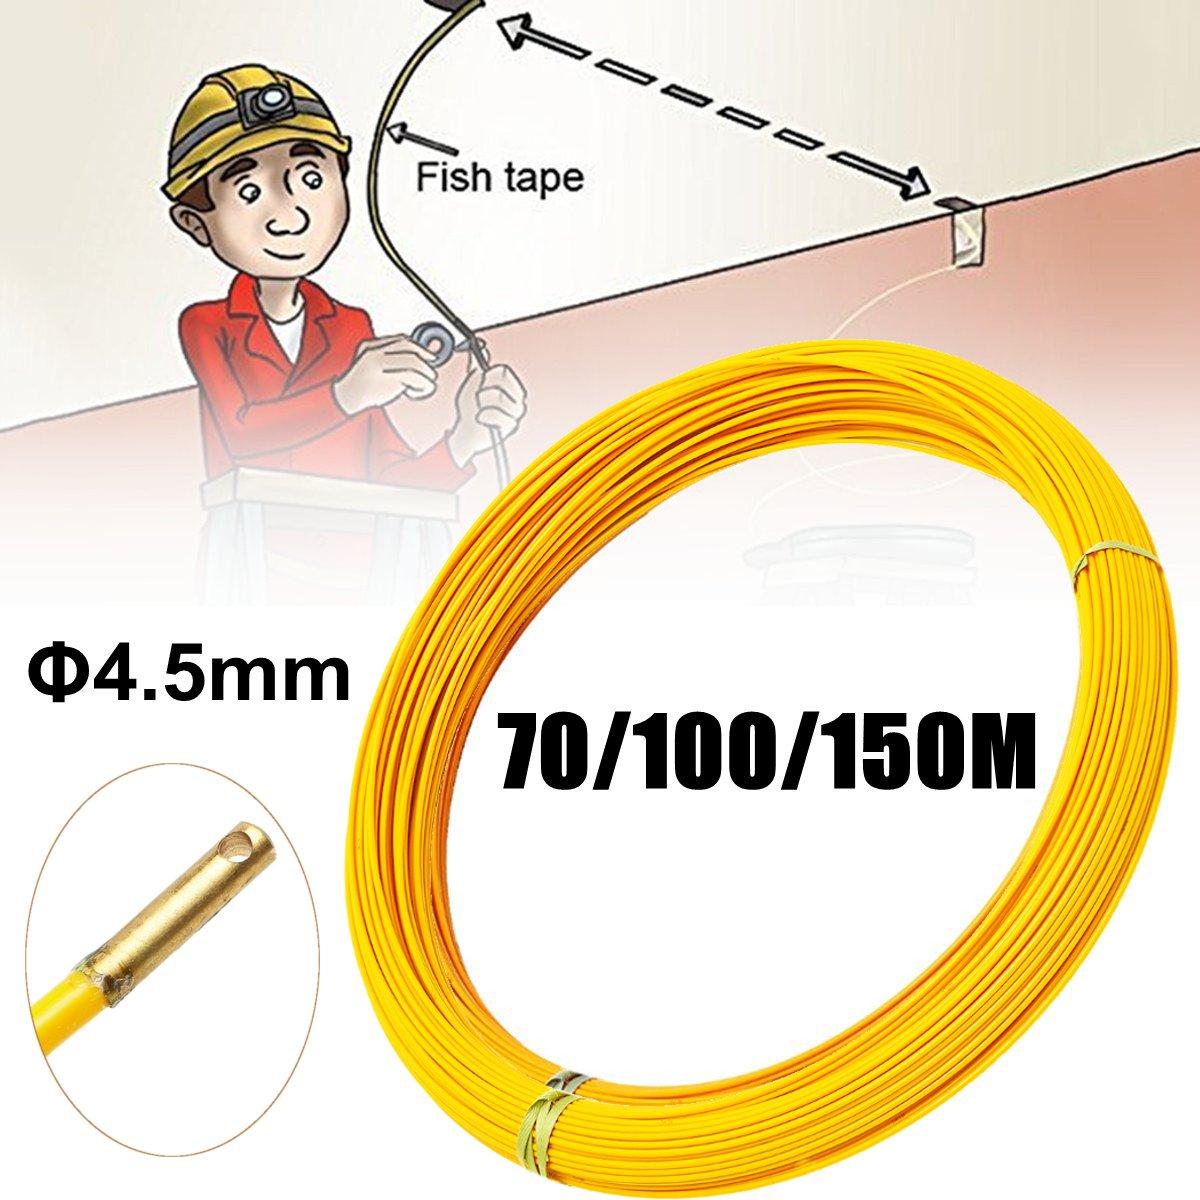 Home Improvement Electrical Equipments & Supplies 4.5mm 100m Fiberglass Wire Cable Running Rod Snake Fish Rodder Puller Flexi Lead Electric Fiberglass Wire Cable Running Rod Attractive And Durable